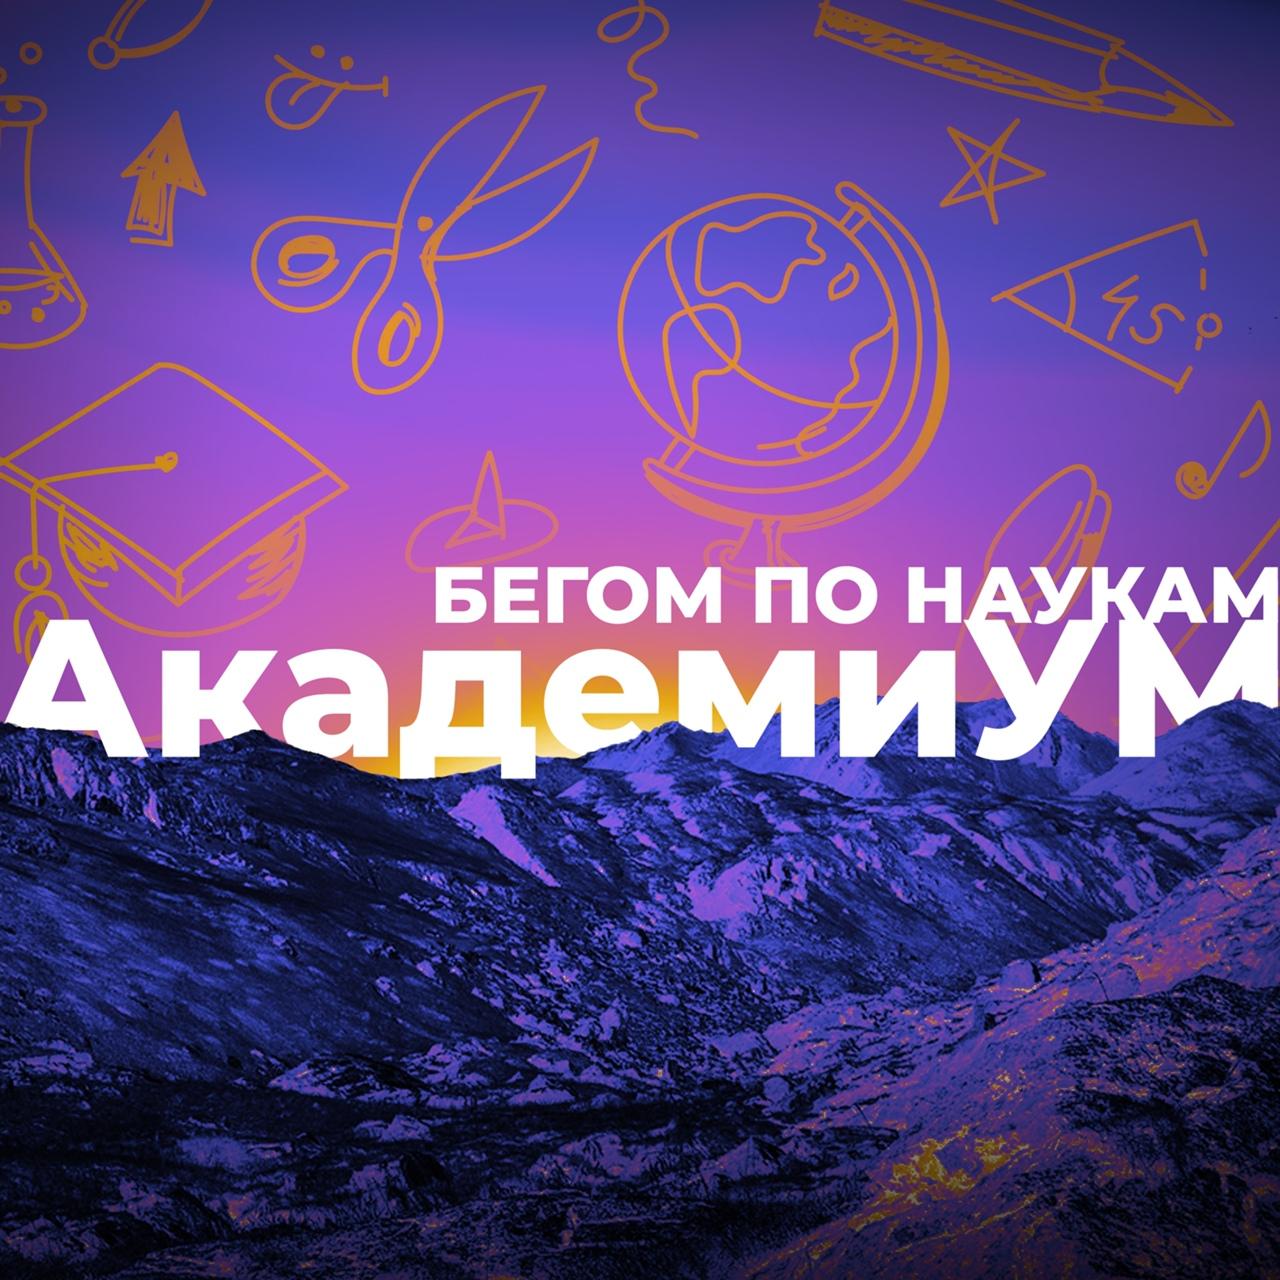 Афиша Ярославль АкадемиУМ